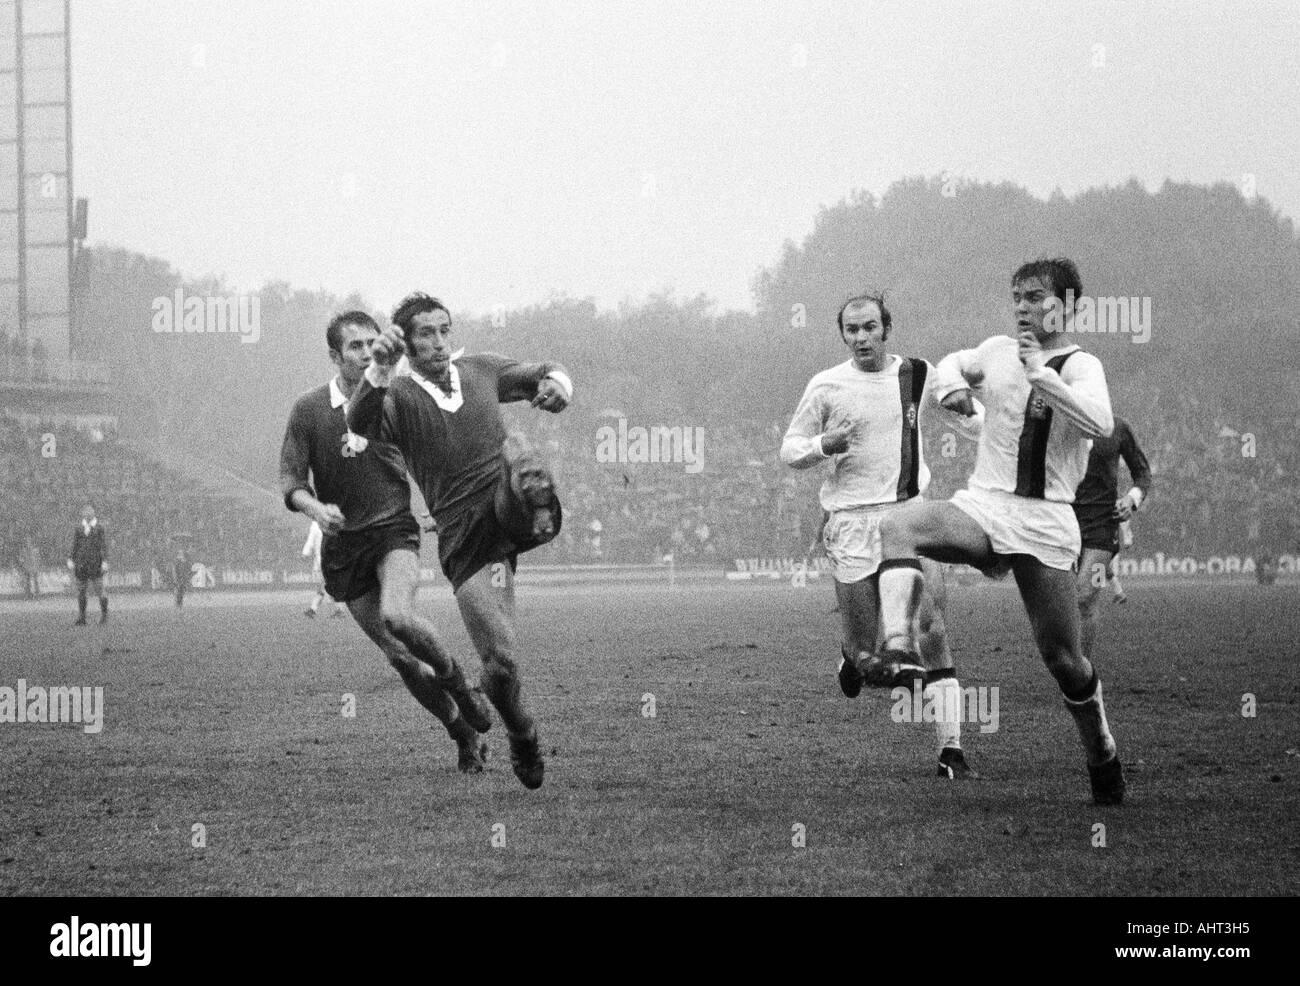 football, Bundesliga, 1970/1971, Wedau Stadium in Duisburg, MSV Duisburg versus Borussia Moenchengladbach 1:1, scene of the match, f.l.t.r. Georg Damjanoff, Djordje Pavlic (both MSV), Horst Koeppel, Herbert Laumen (both MG) - Stock Image